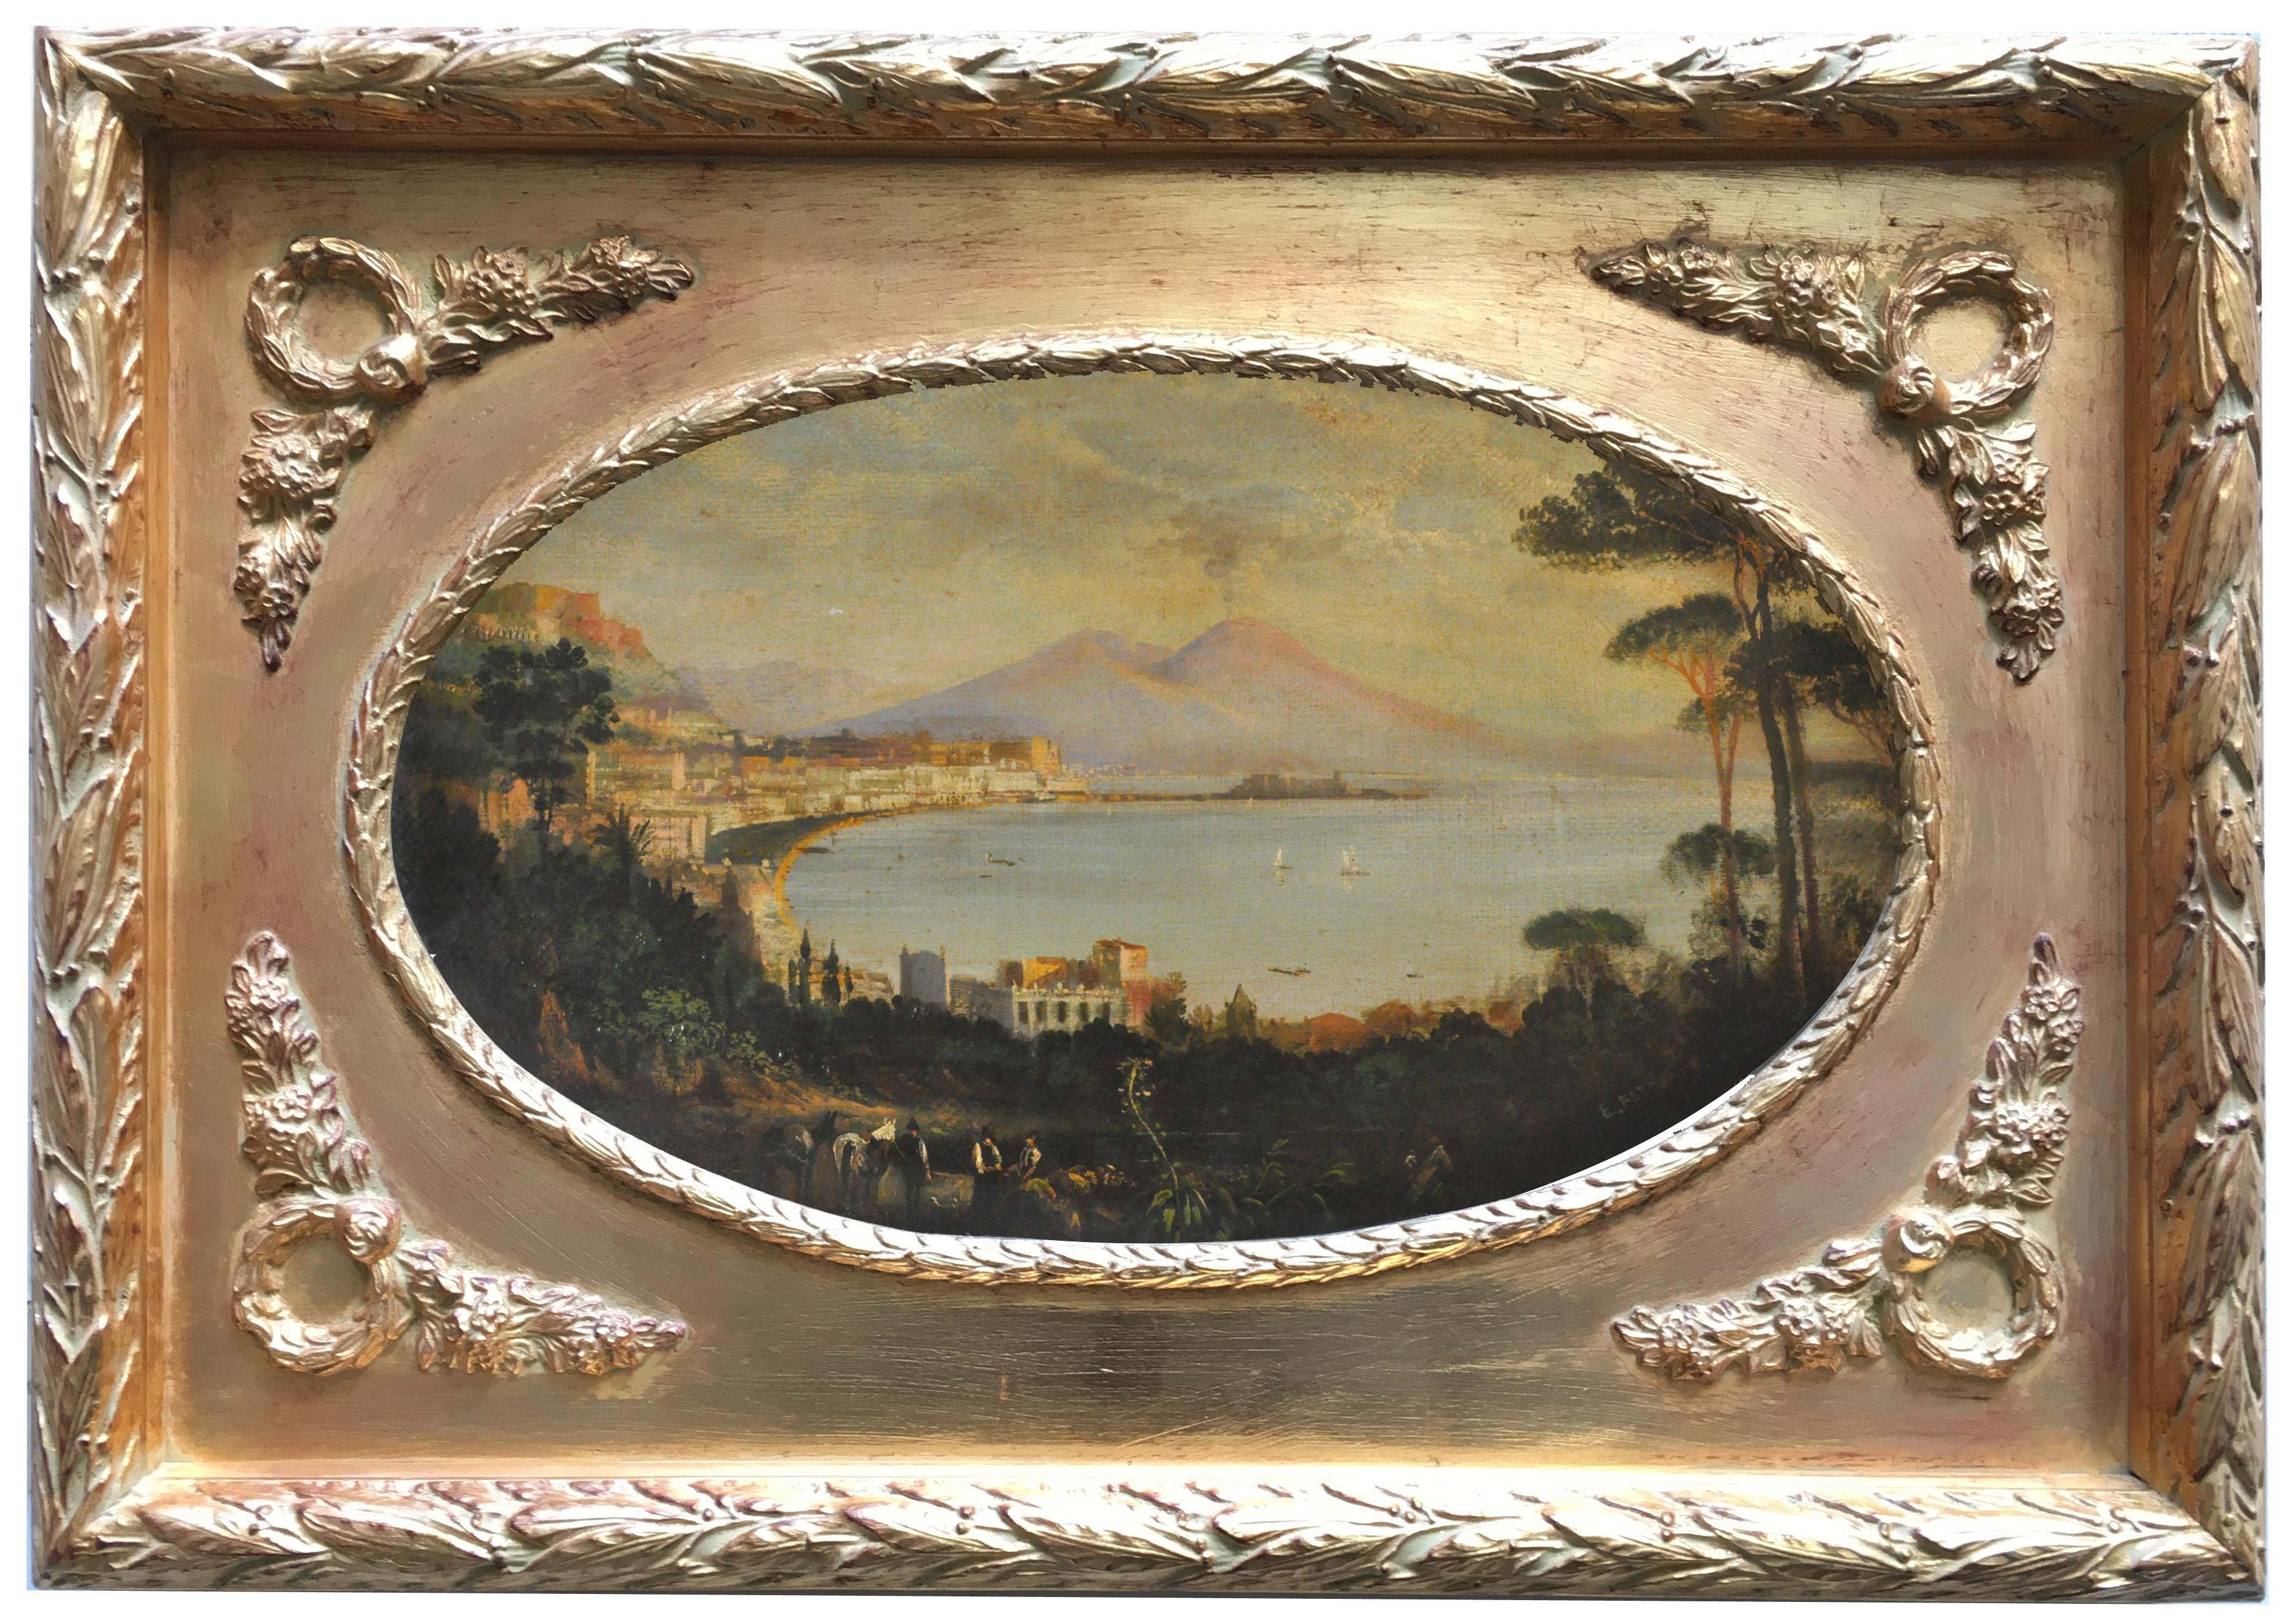 VIEW OF NAPLES -Posillipo School -  Italian Landscape Oil on Canvas Painting